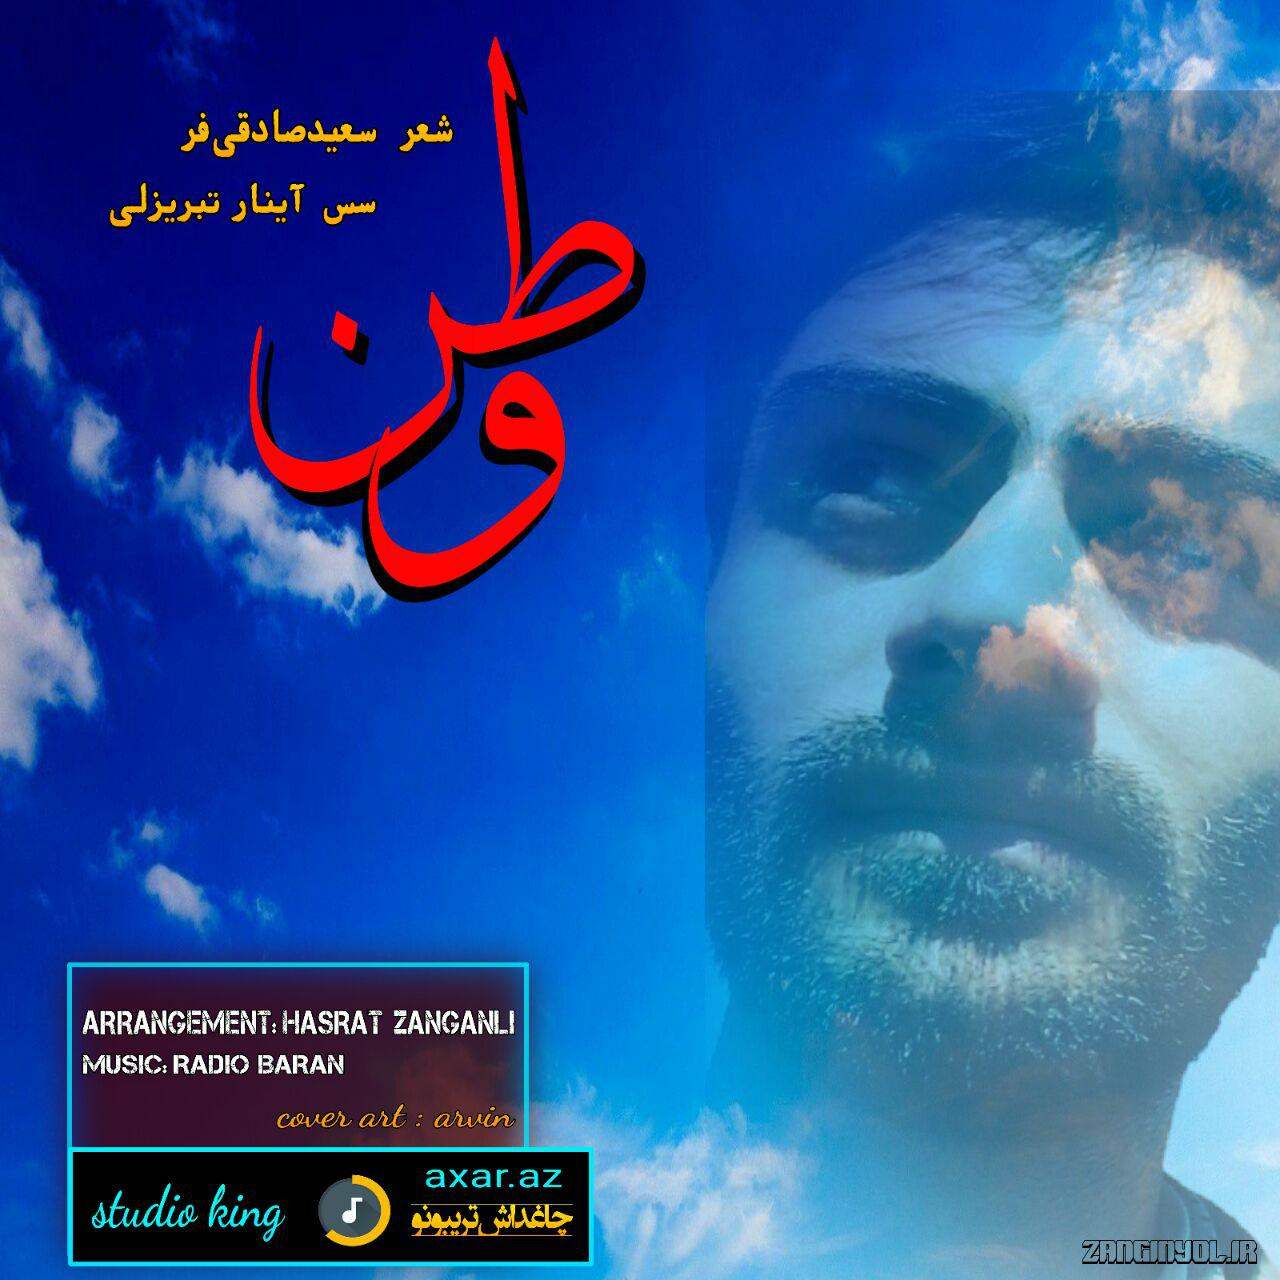 http://s8.picofile.com/file/8343254376/13Aynar_Tabrizli_Vatan.jpg